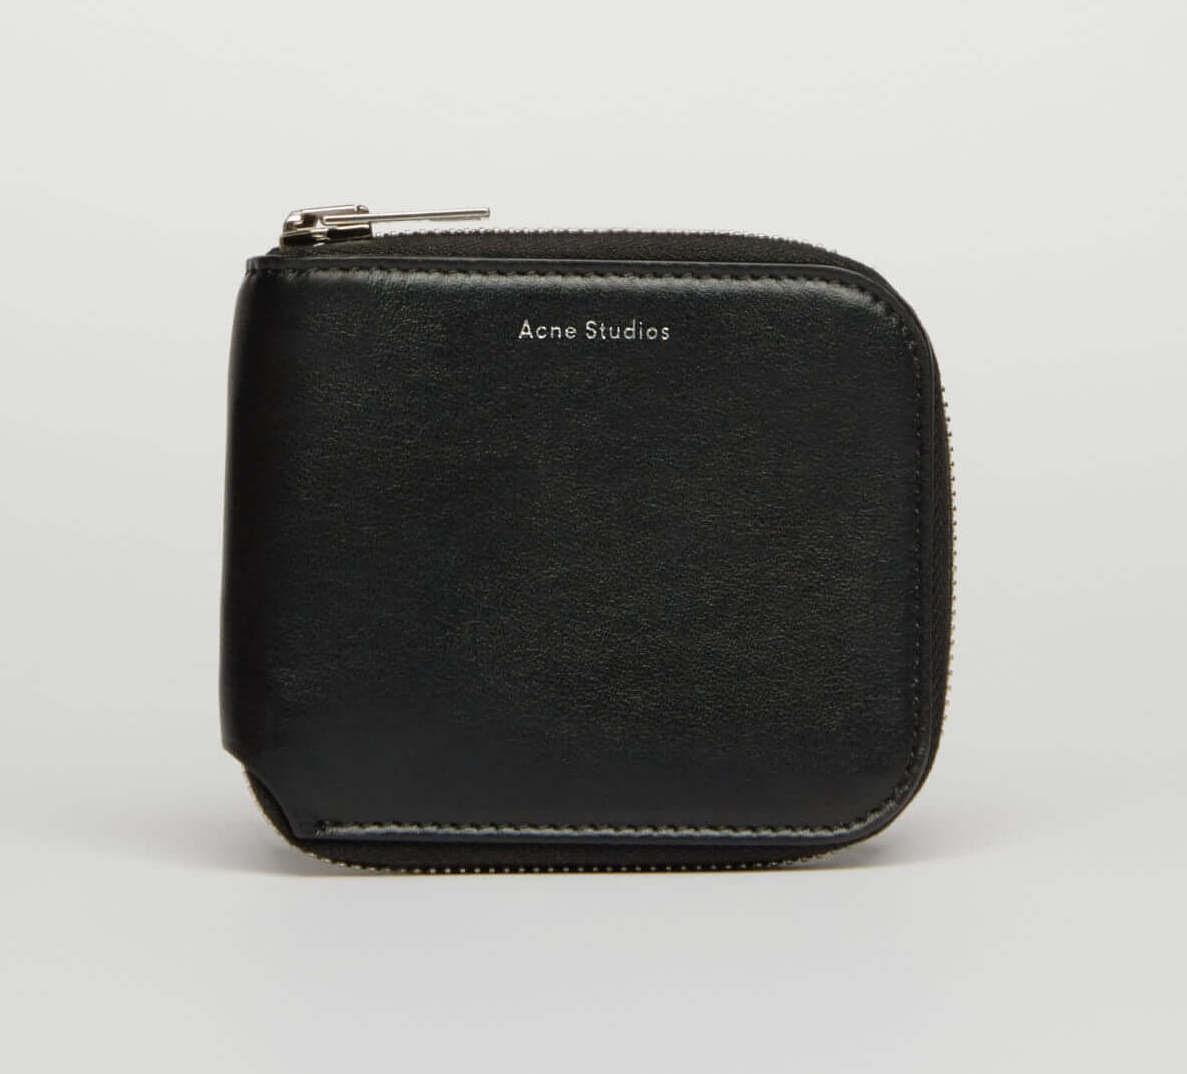 Acne Studios Kei S Wallet, $210